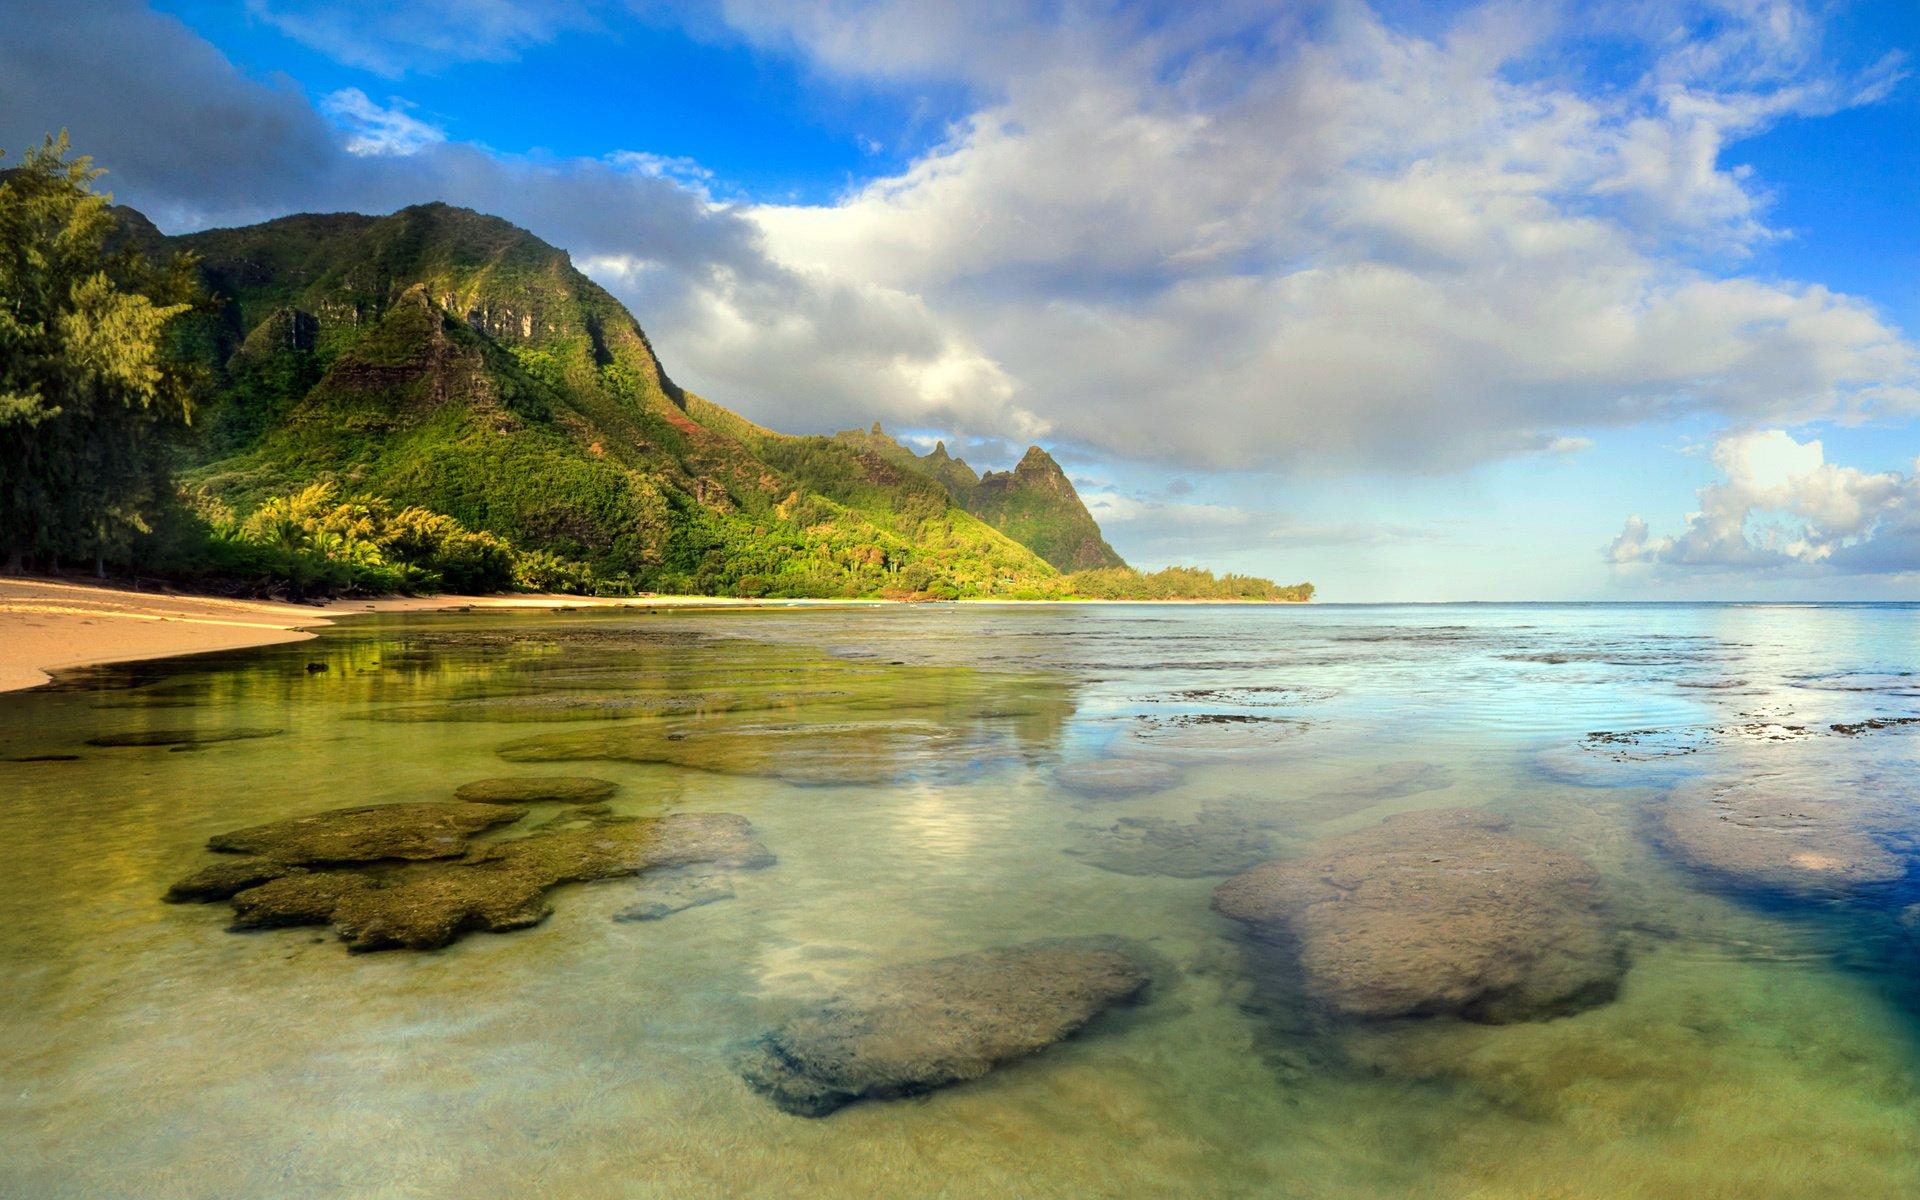 Tunnels Beach Kauai Hawaii HD Wallpaper Background Image 1920x1200